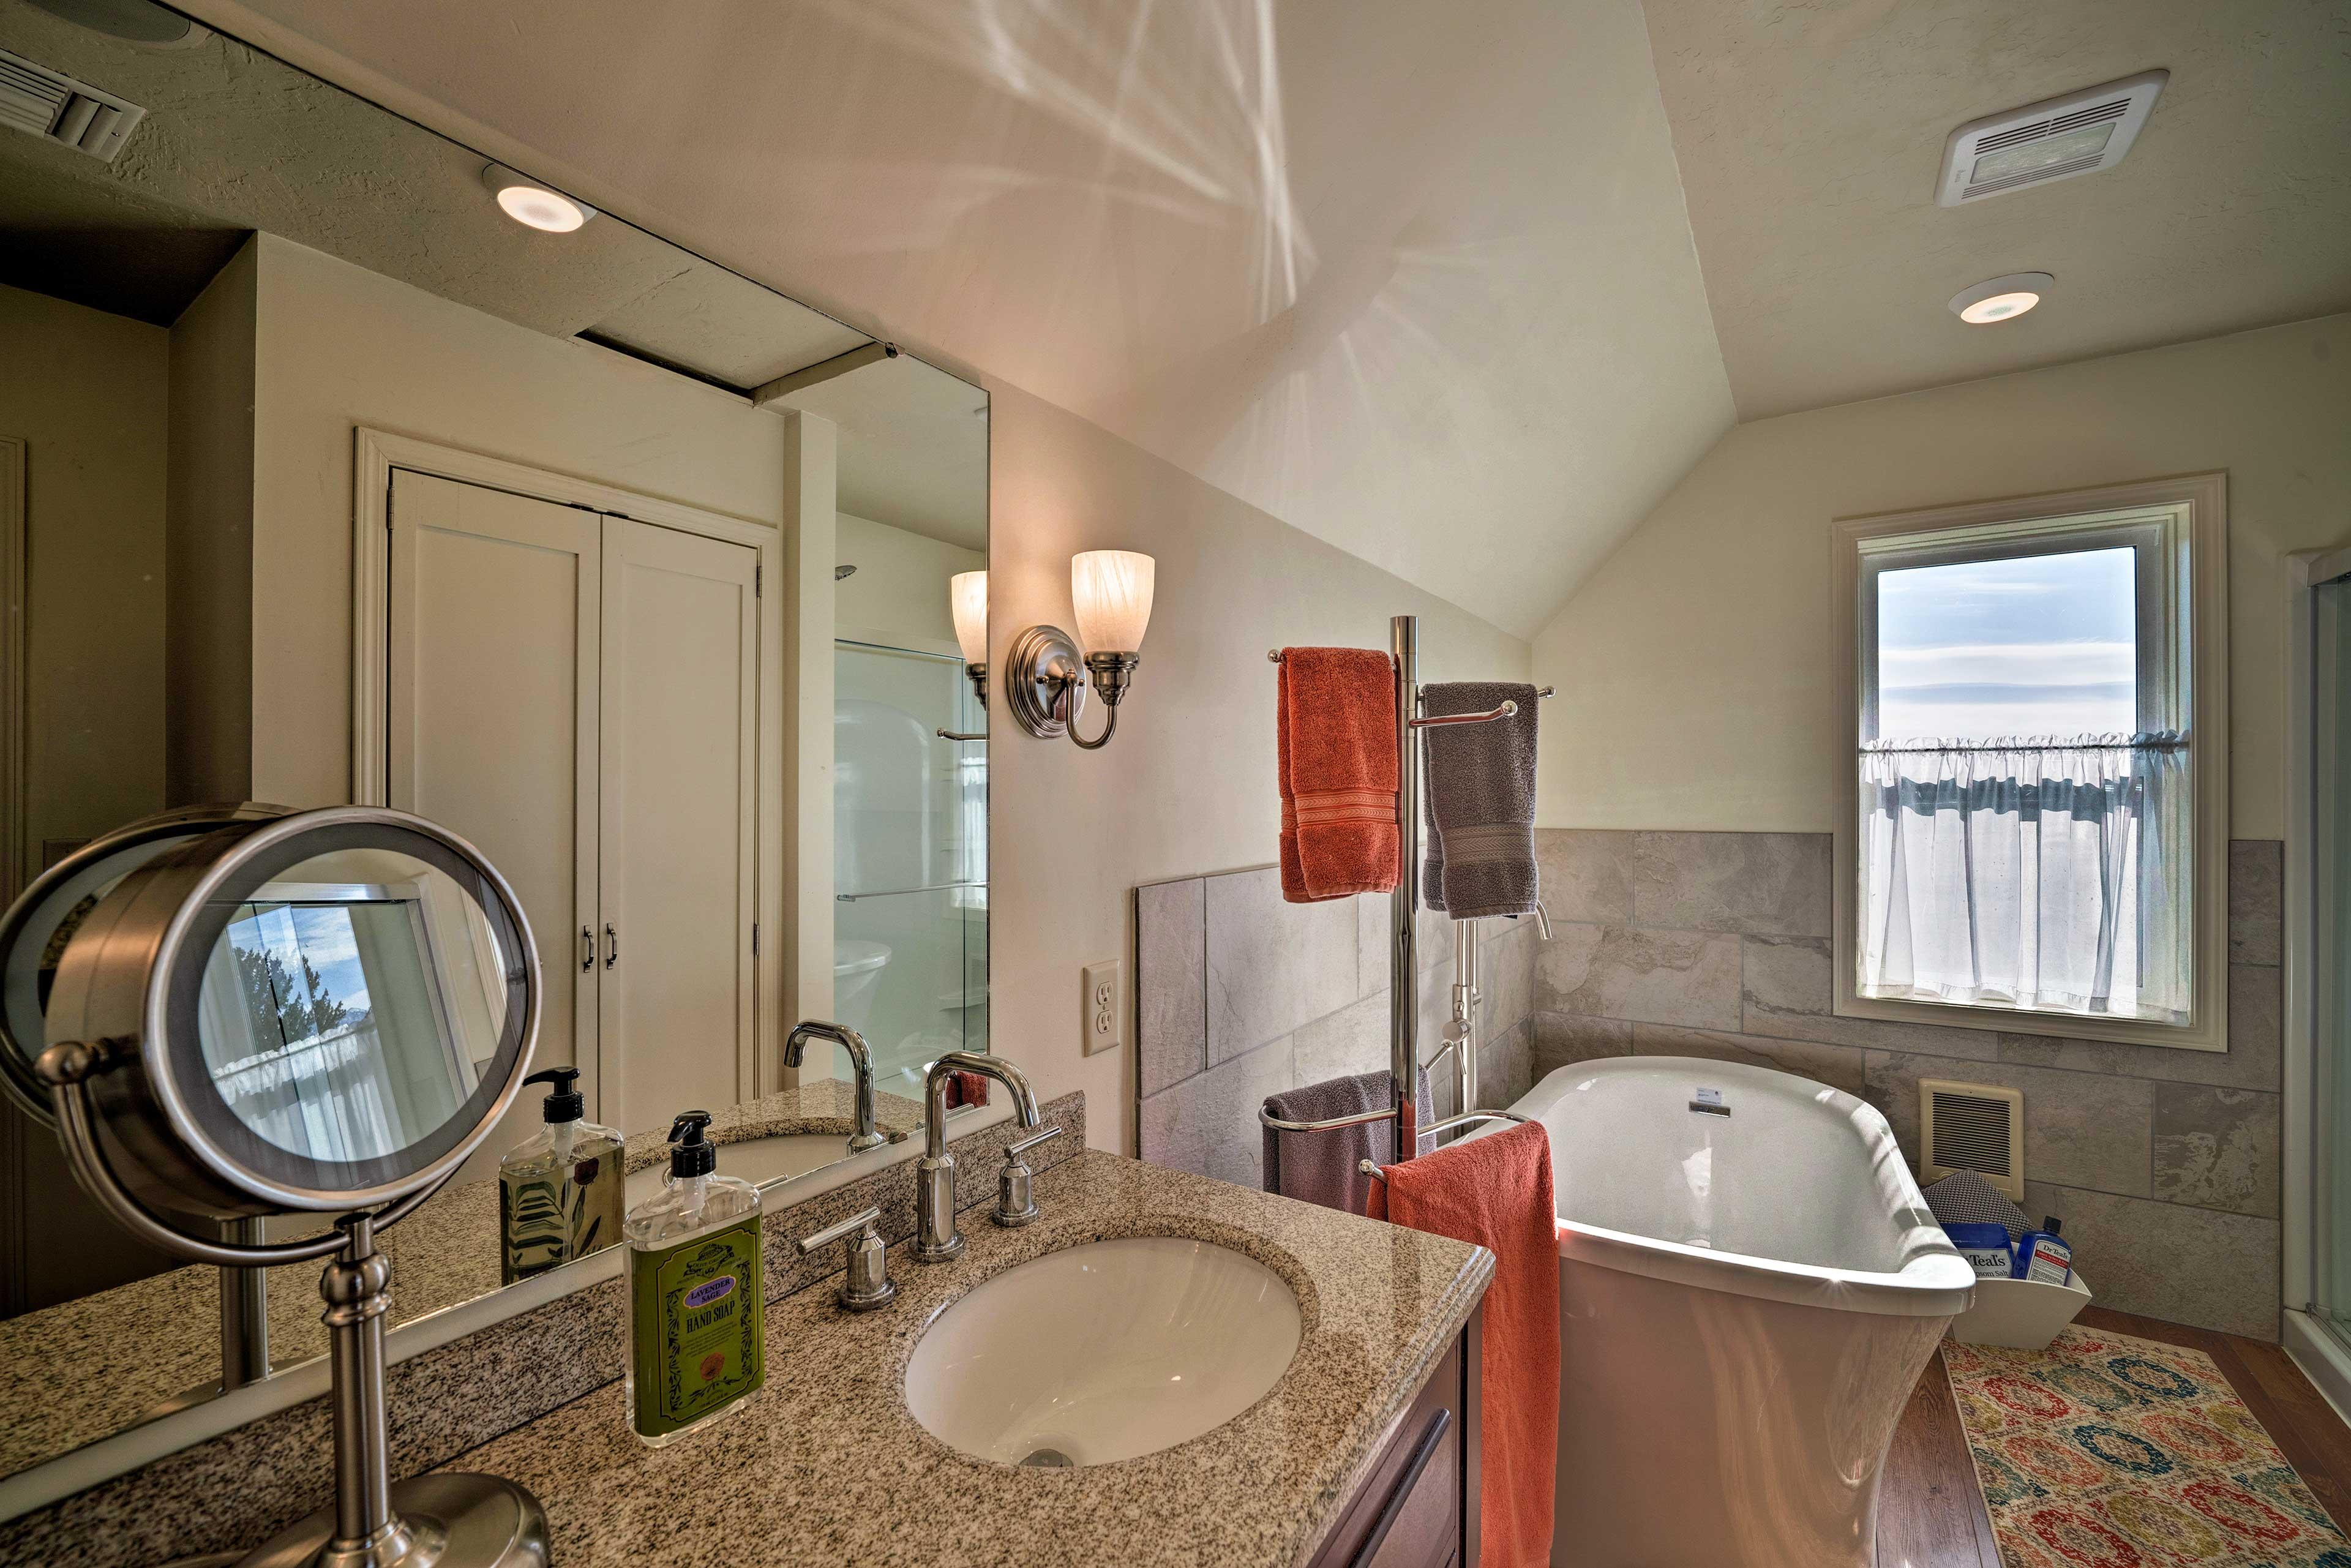 The en-suite bathroom has a large soaking tub.